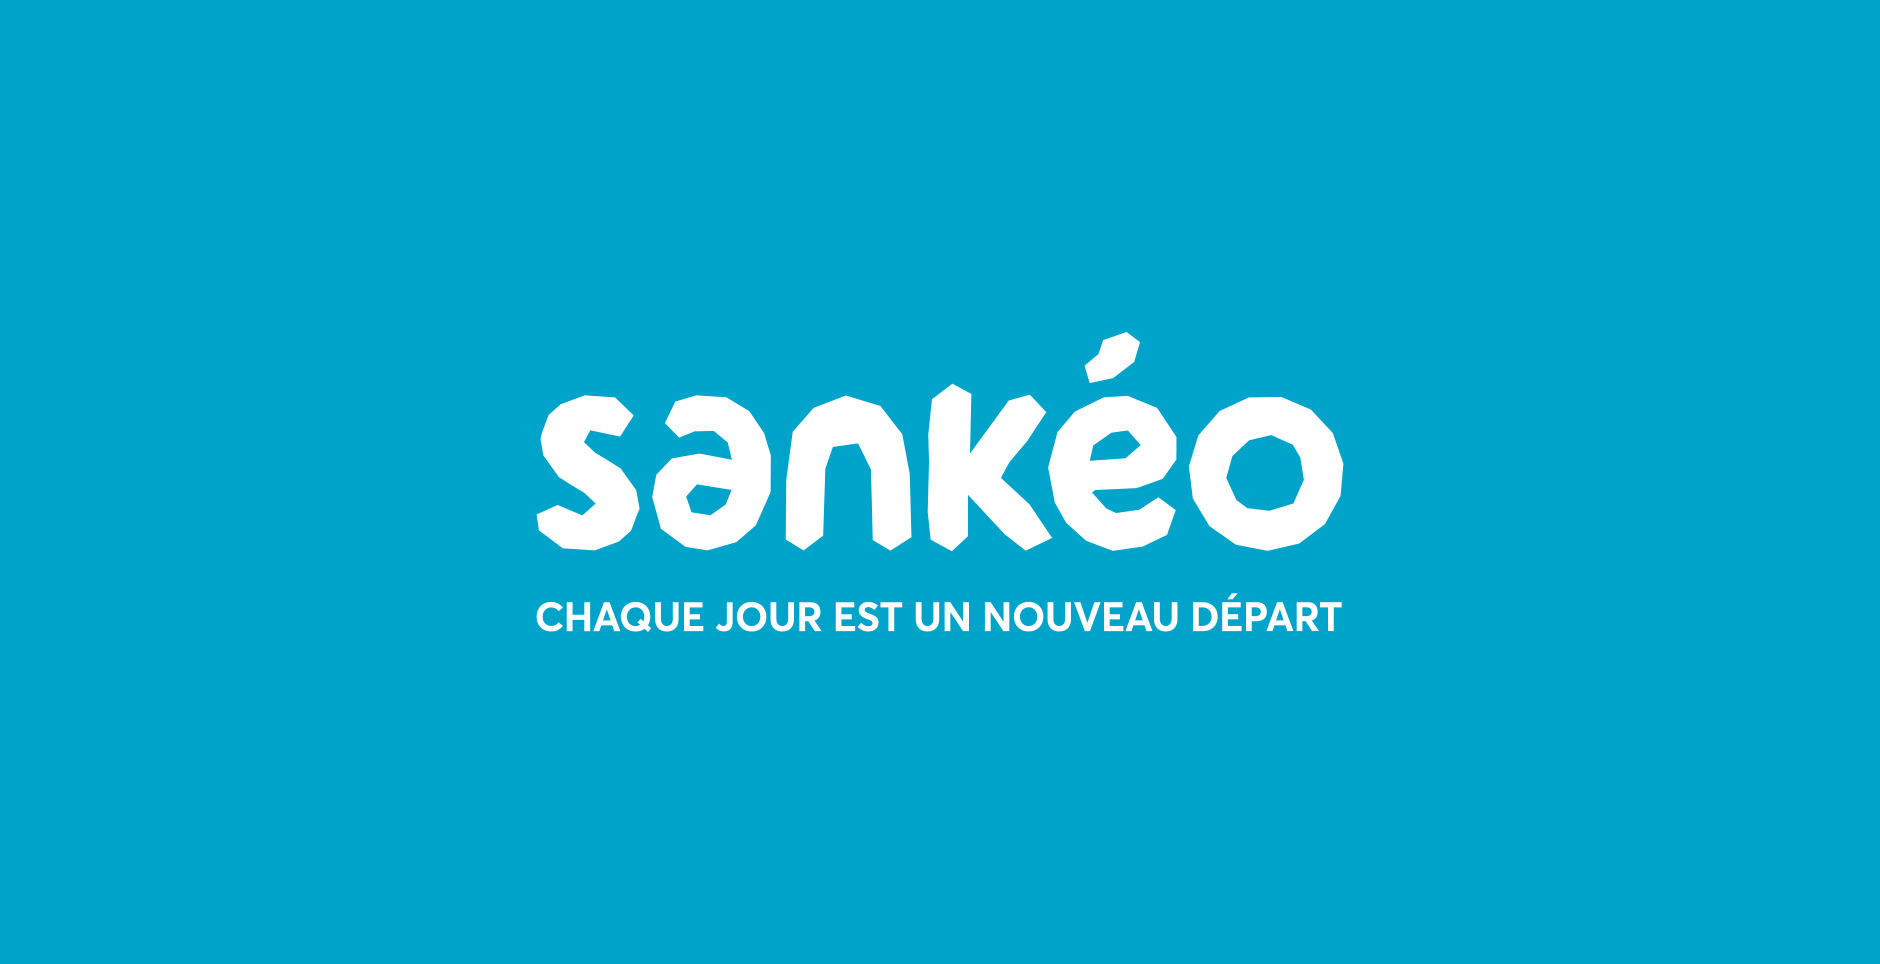 Sankeo_web